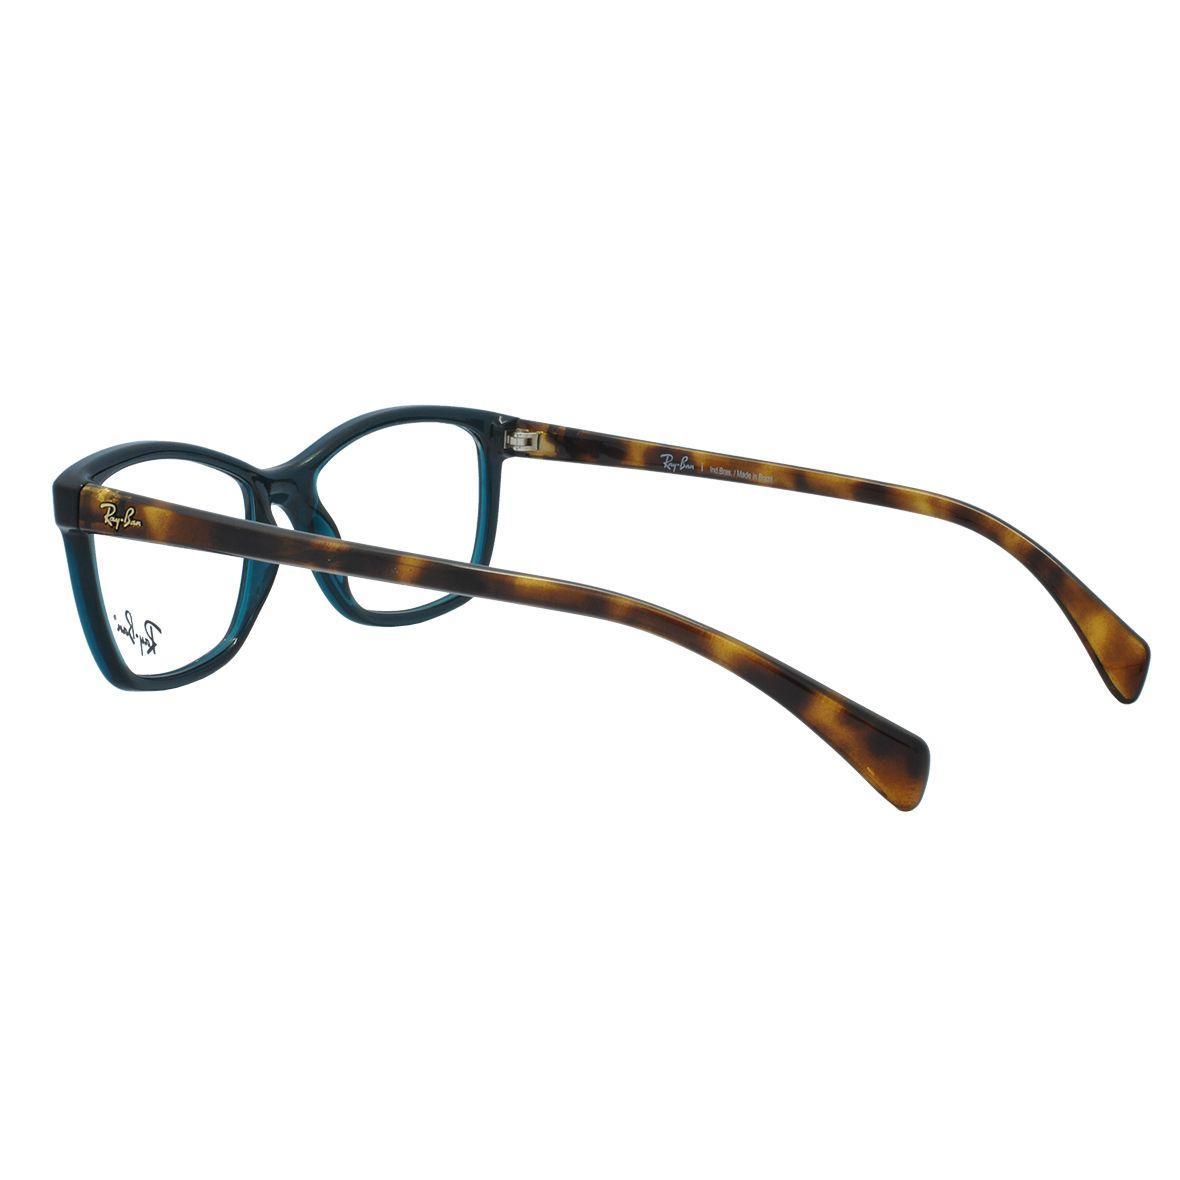 32eccaabb5f01 Óculos de Grau Ray Ban Feminino RX7108L 5704 - Acetato Verde Transparência  com Tartaruga Marrom R  391